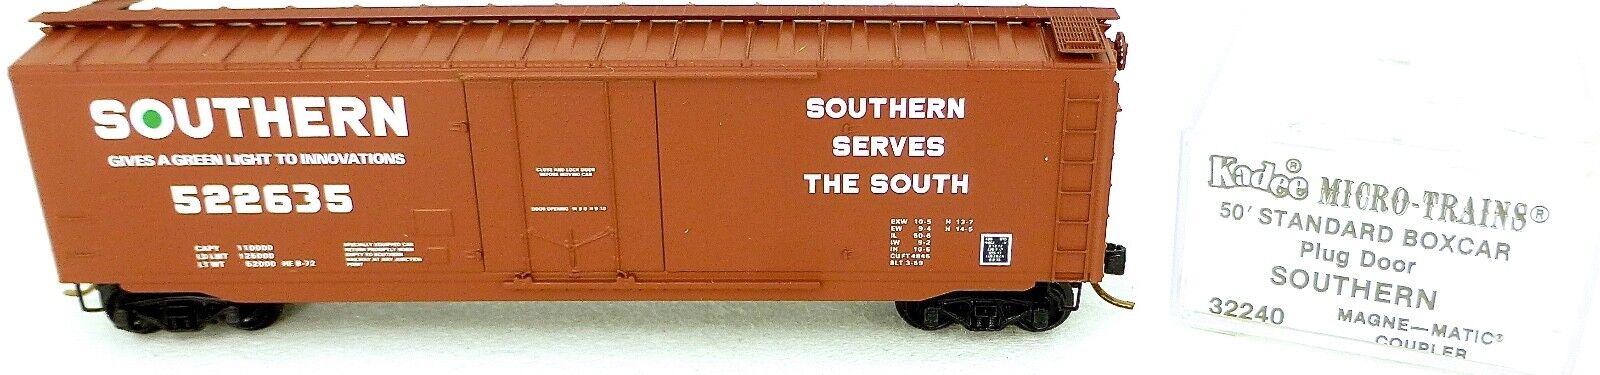 50´ Standard Boxcar SOUTHERN 522635 Micro Trains Line 32240 n 1 160 c å